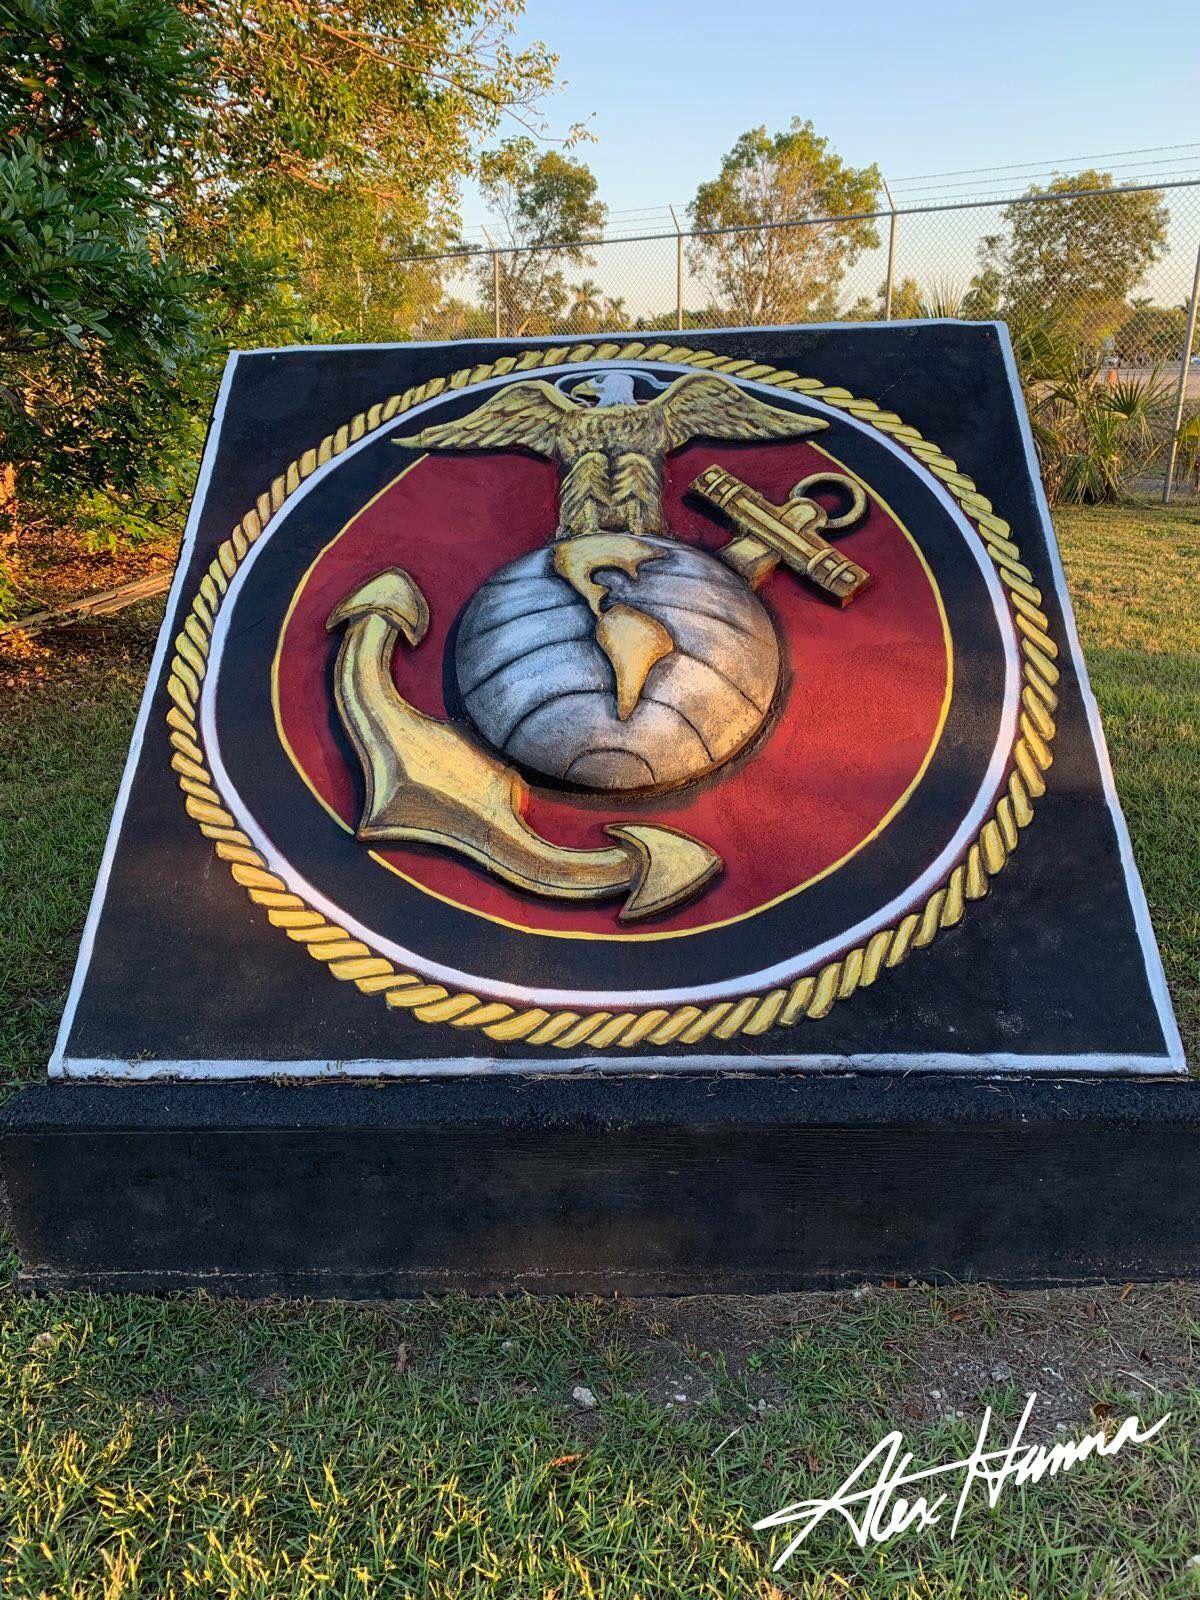 Semper Fi! God Bless the Marine Corp! Happy birthday